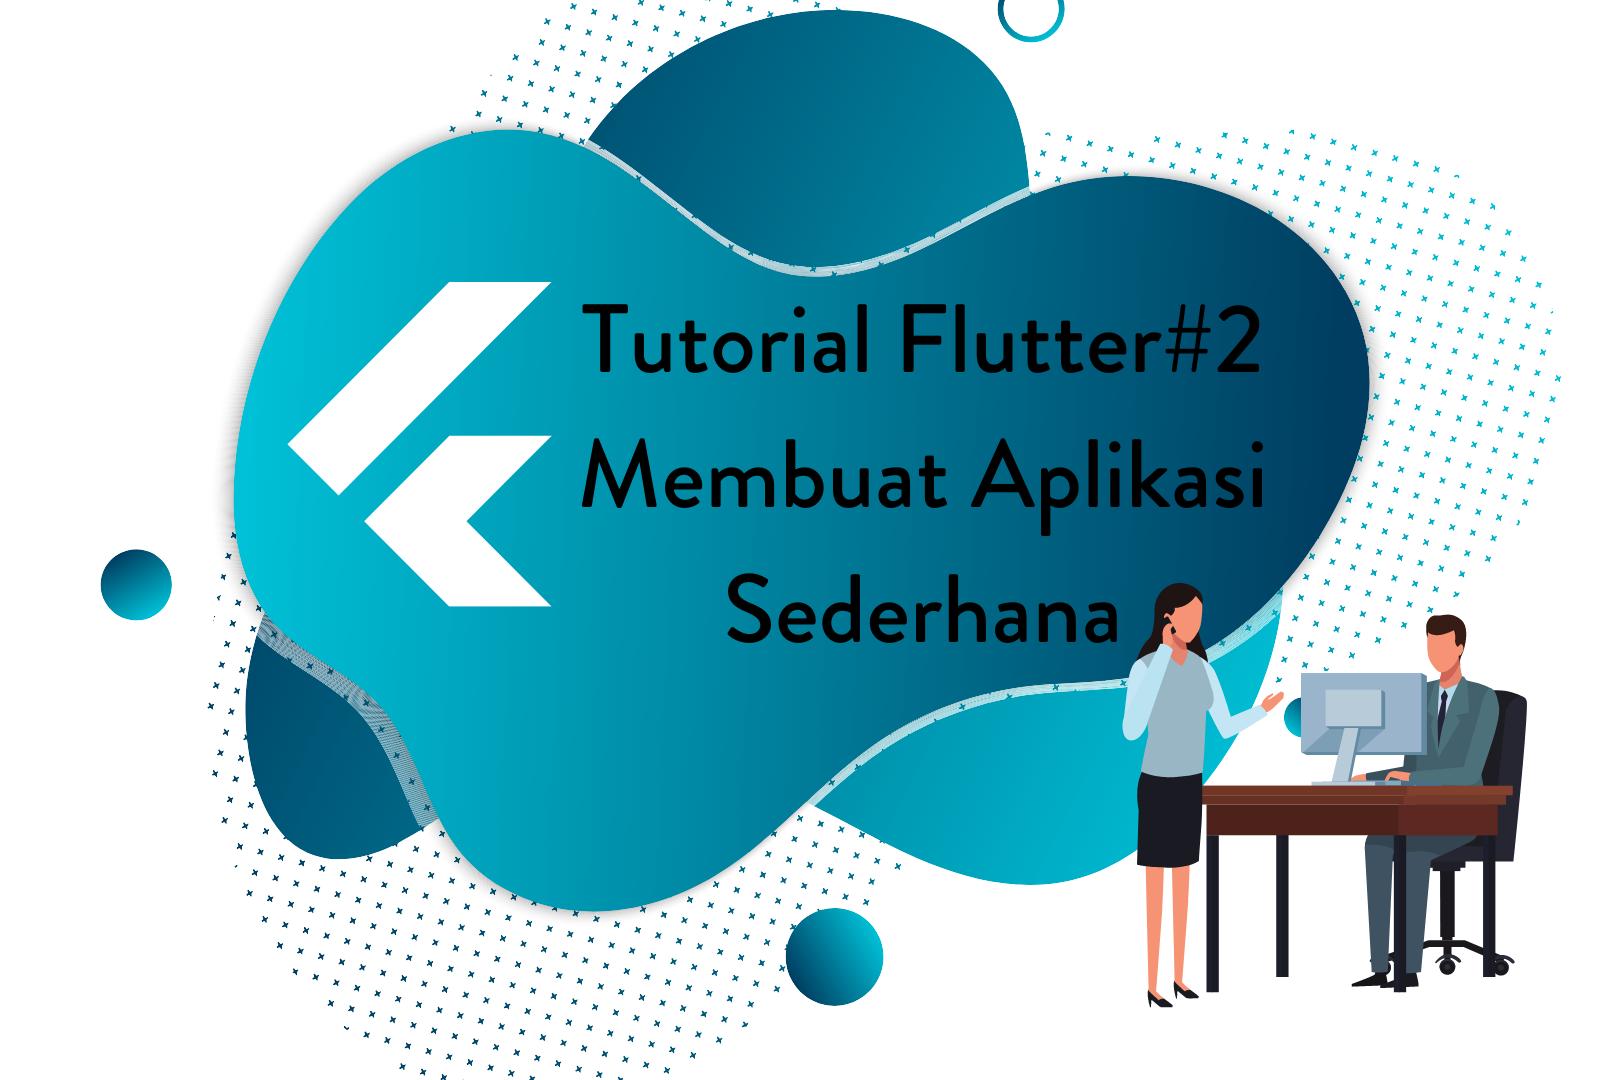 Tutorial Flutter #2 : Membuat Aplikasi Flutter Untuk Pemula